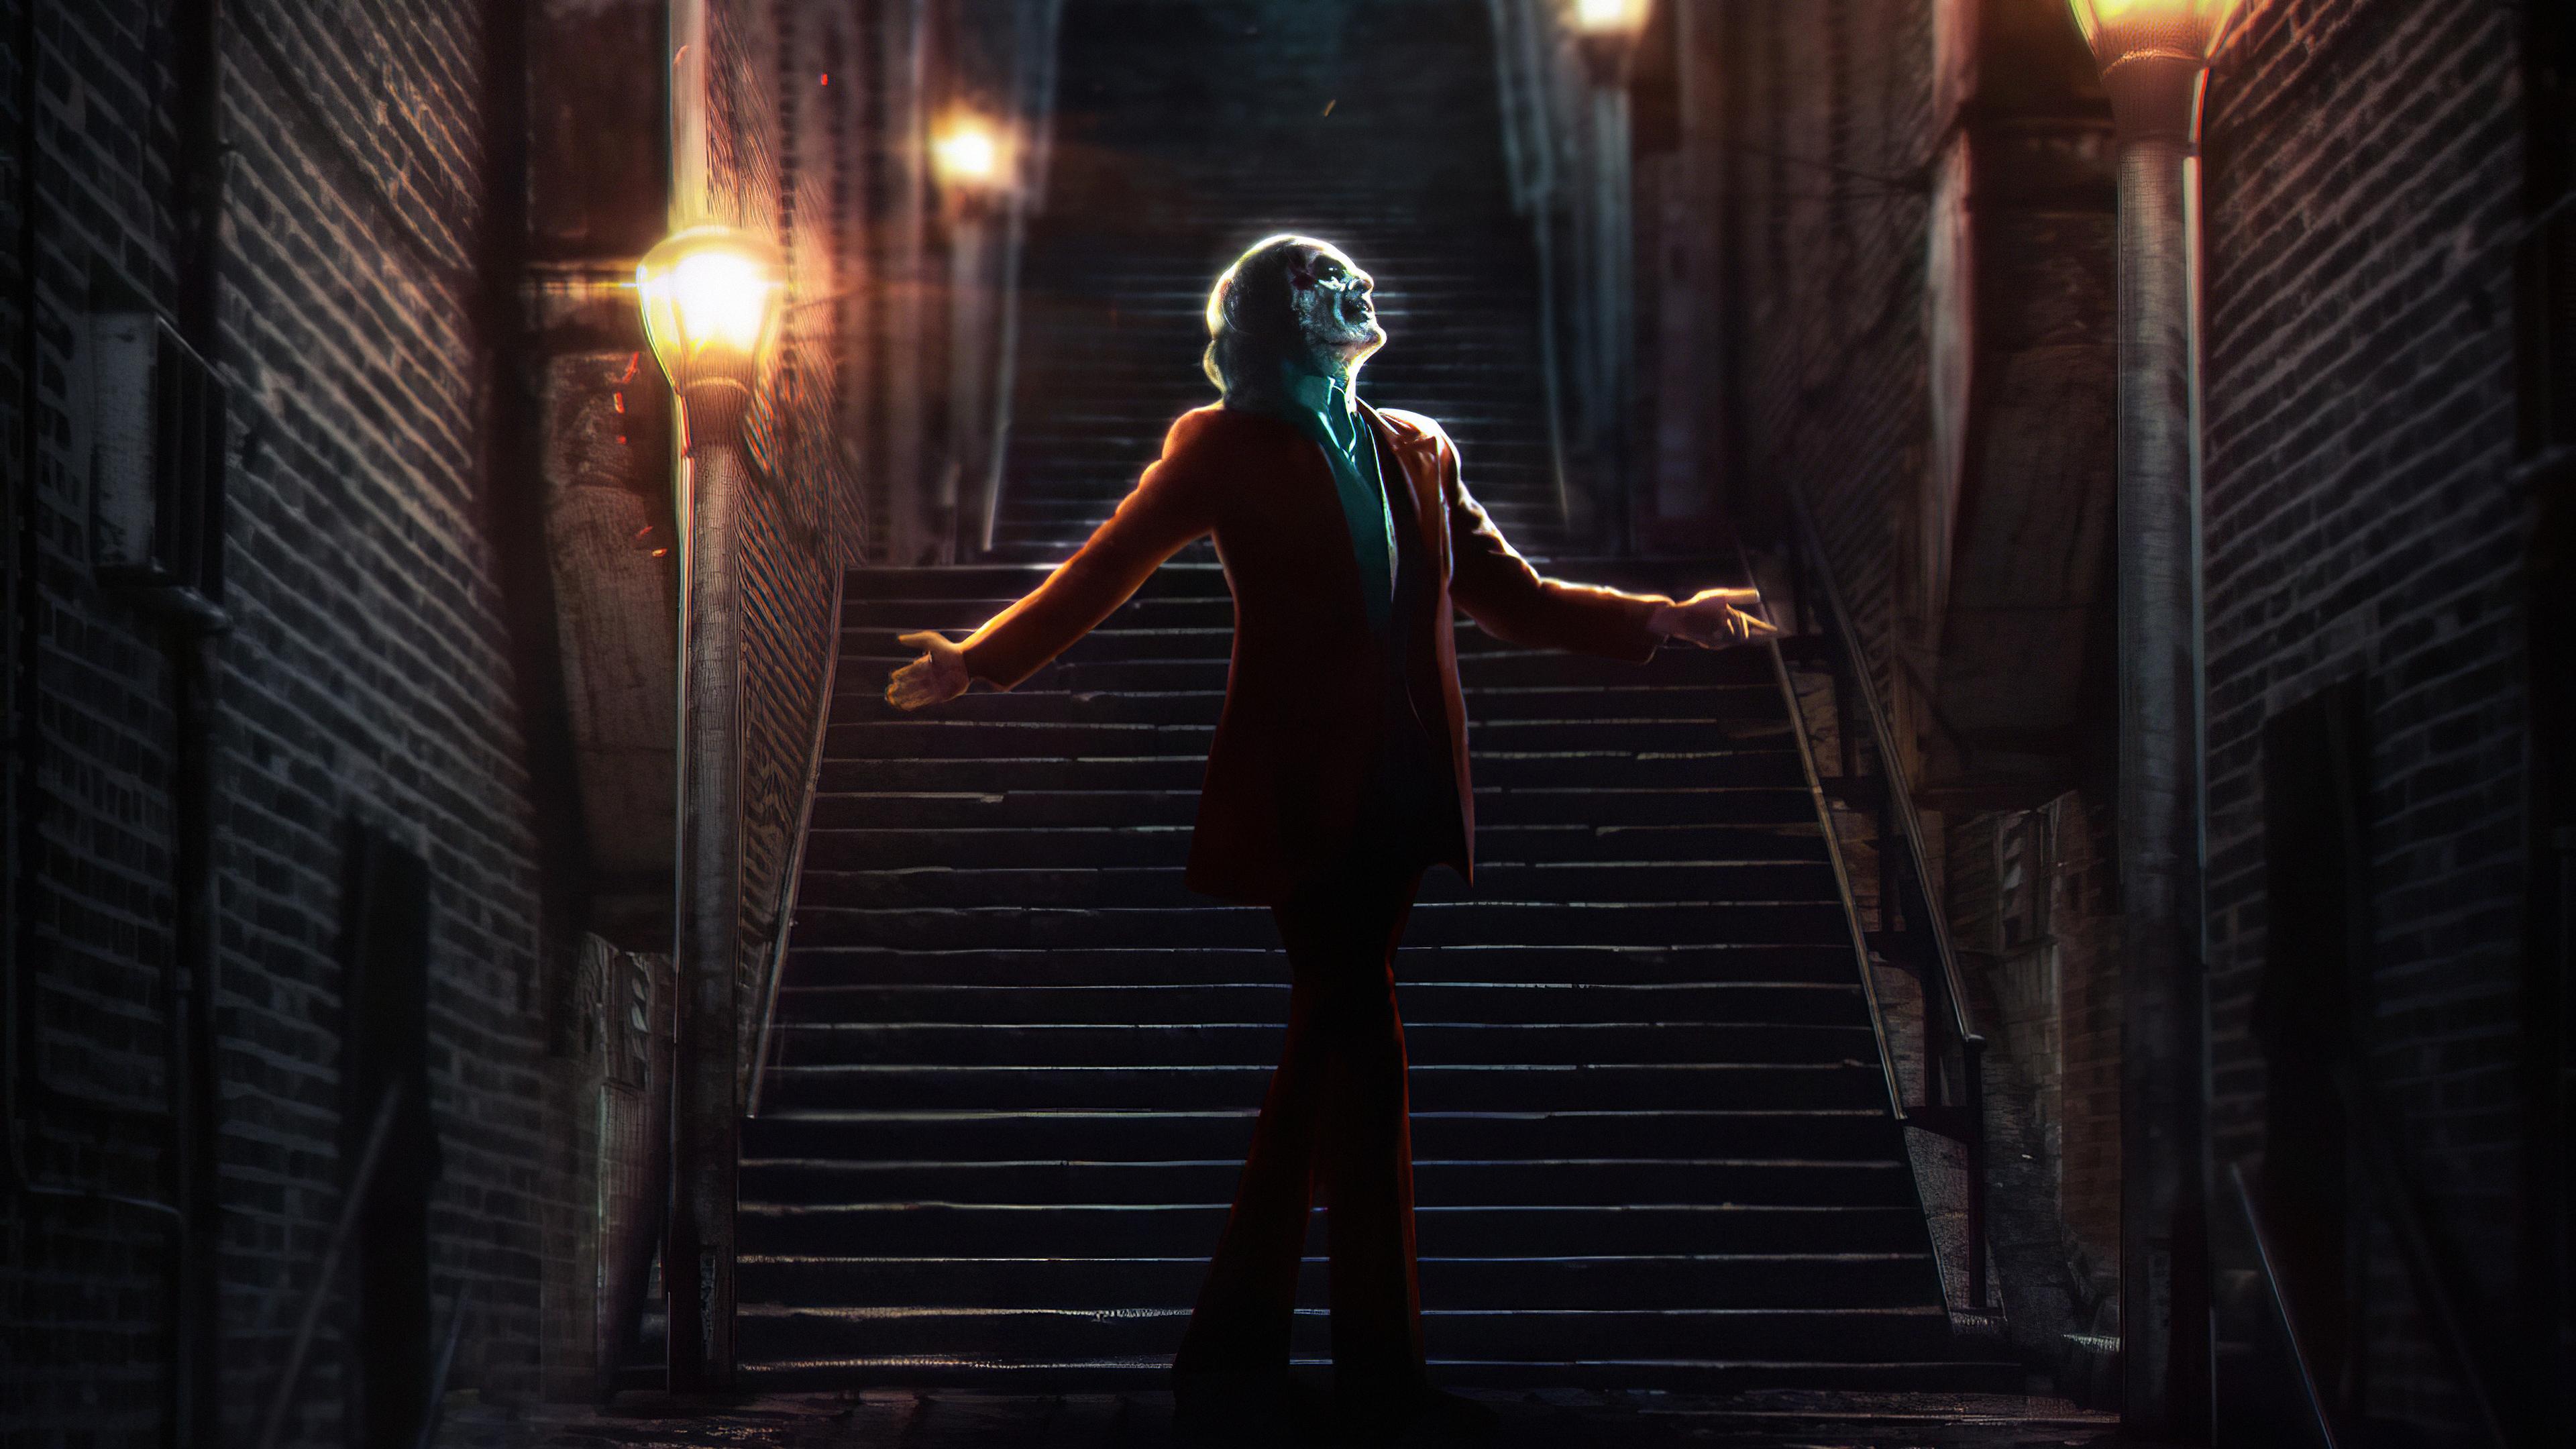 joker 2019 1572371012 - Joker 2019 - supervillain wallpapers, superheroes wallpapers, joker wallpapers, joker movie wallpapers, hd-wallpapers, 4k-wallpapers